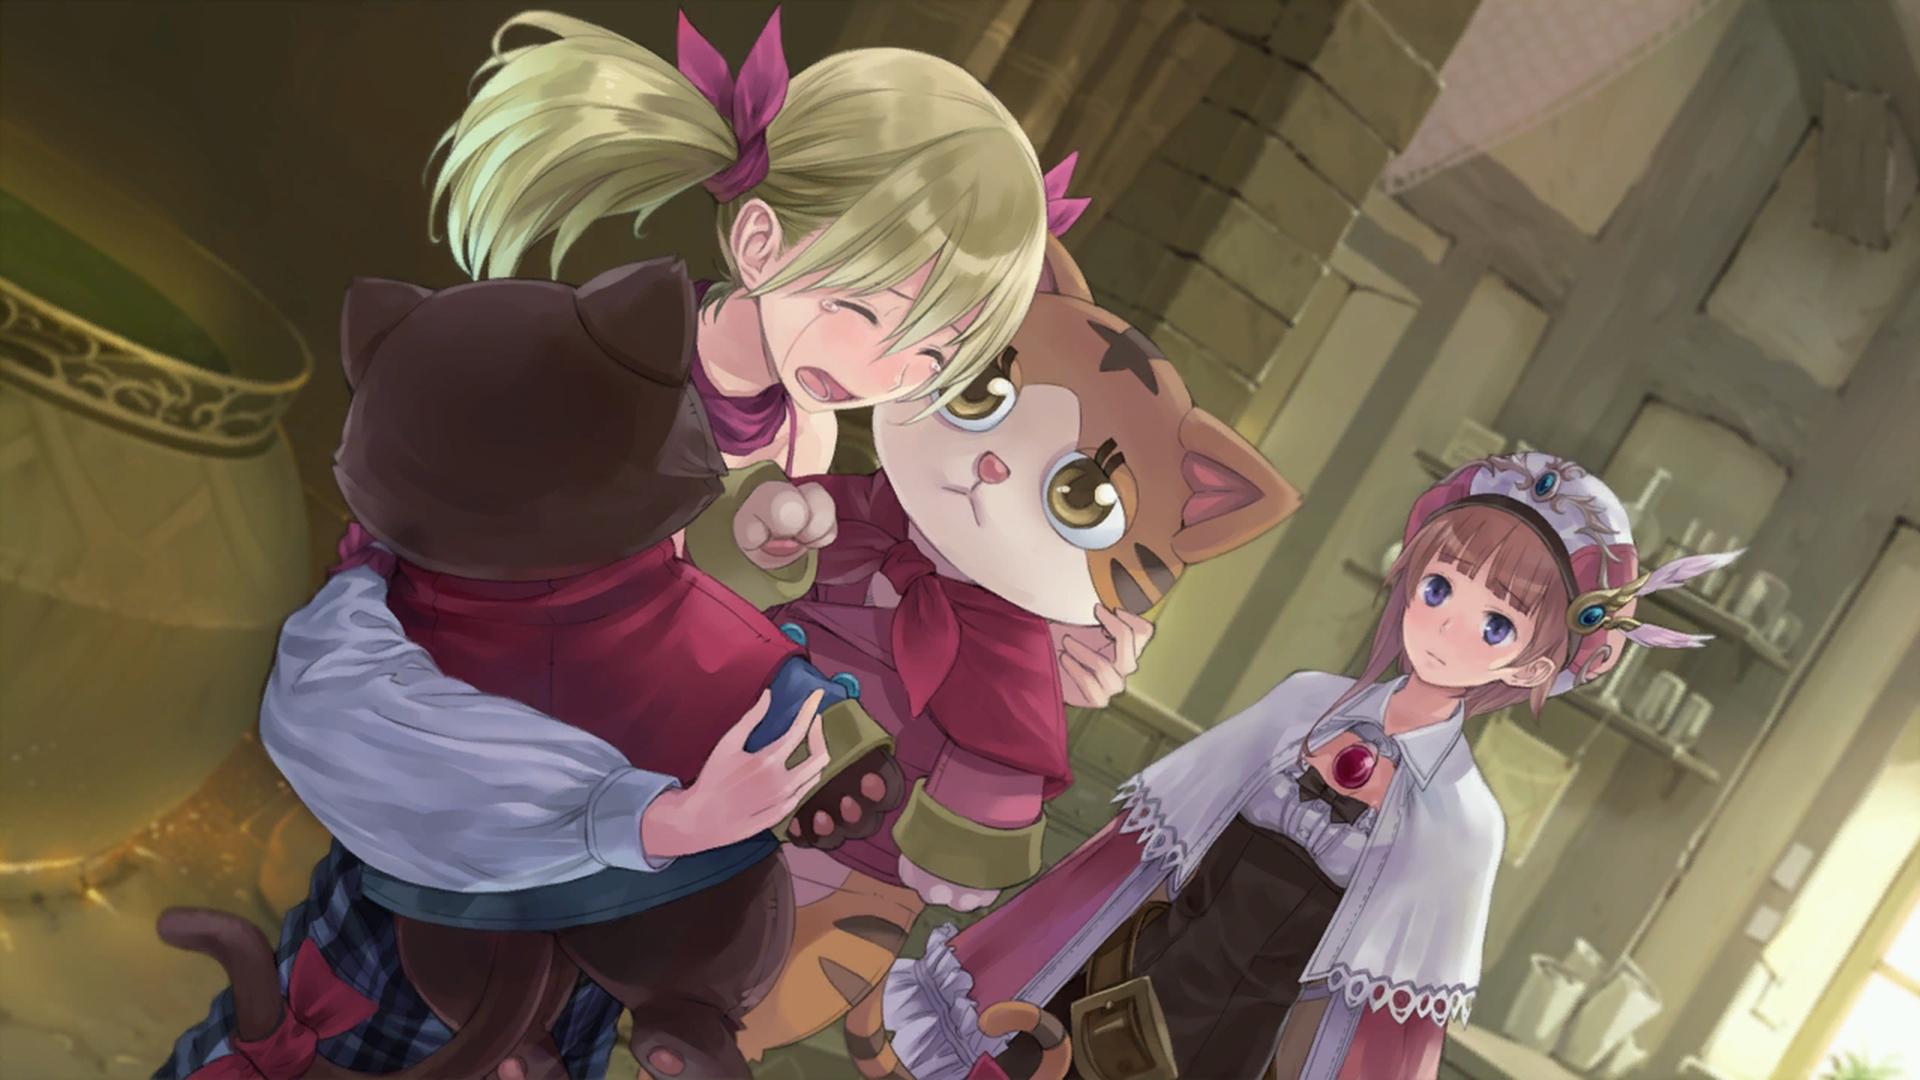 Atelier Rorona The Alchemist of Arland Wallpaper 027